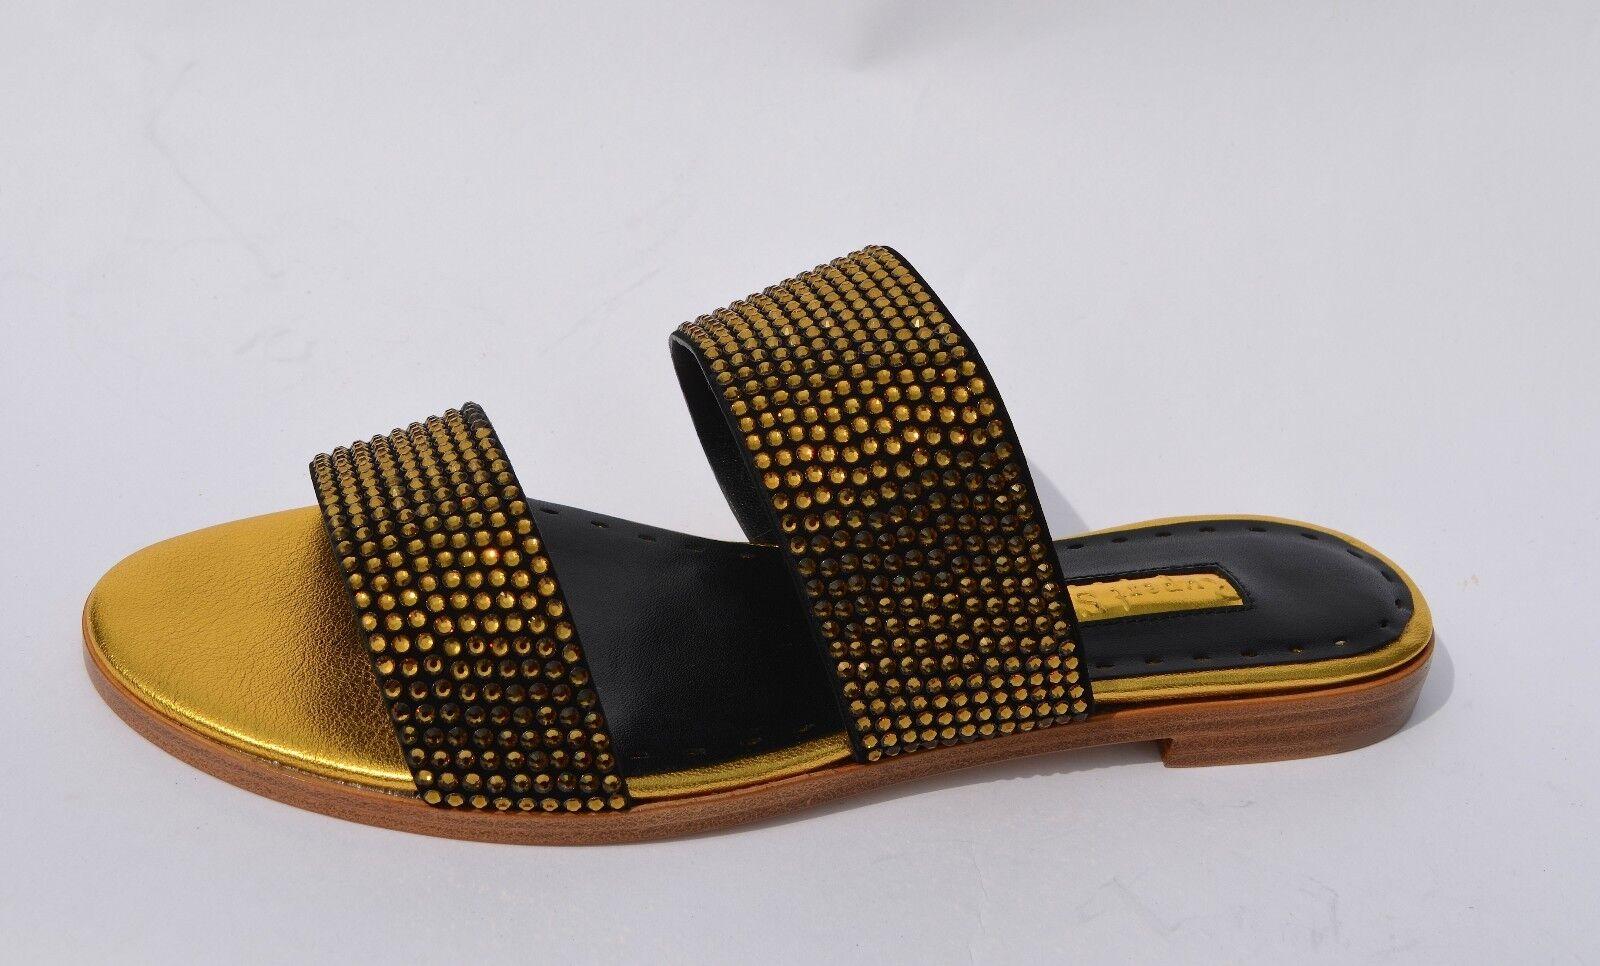 Rupert Sanderson Janis Oro Cristallo E Pantofole in Pelle Nera UK3/EU36